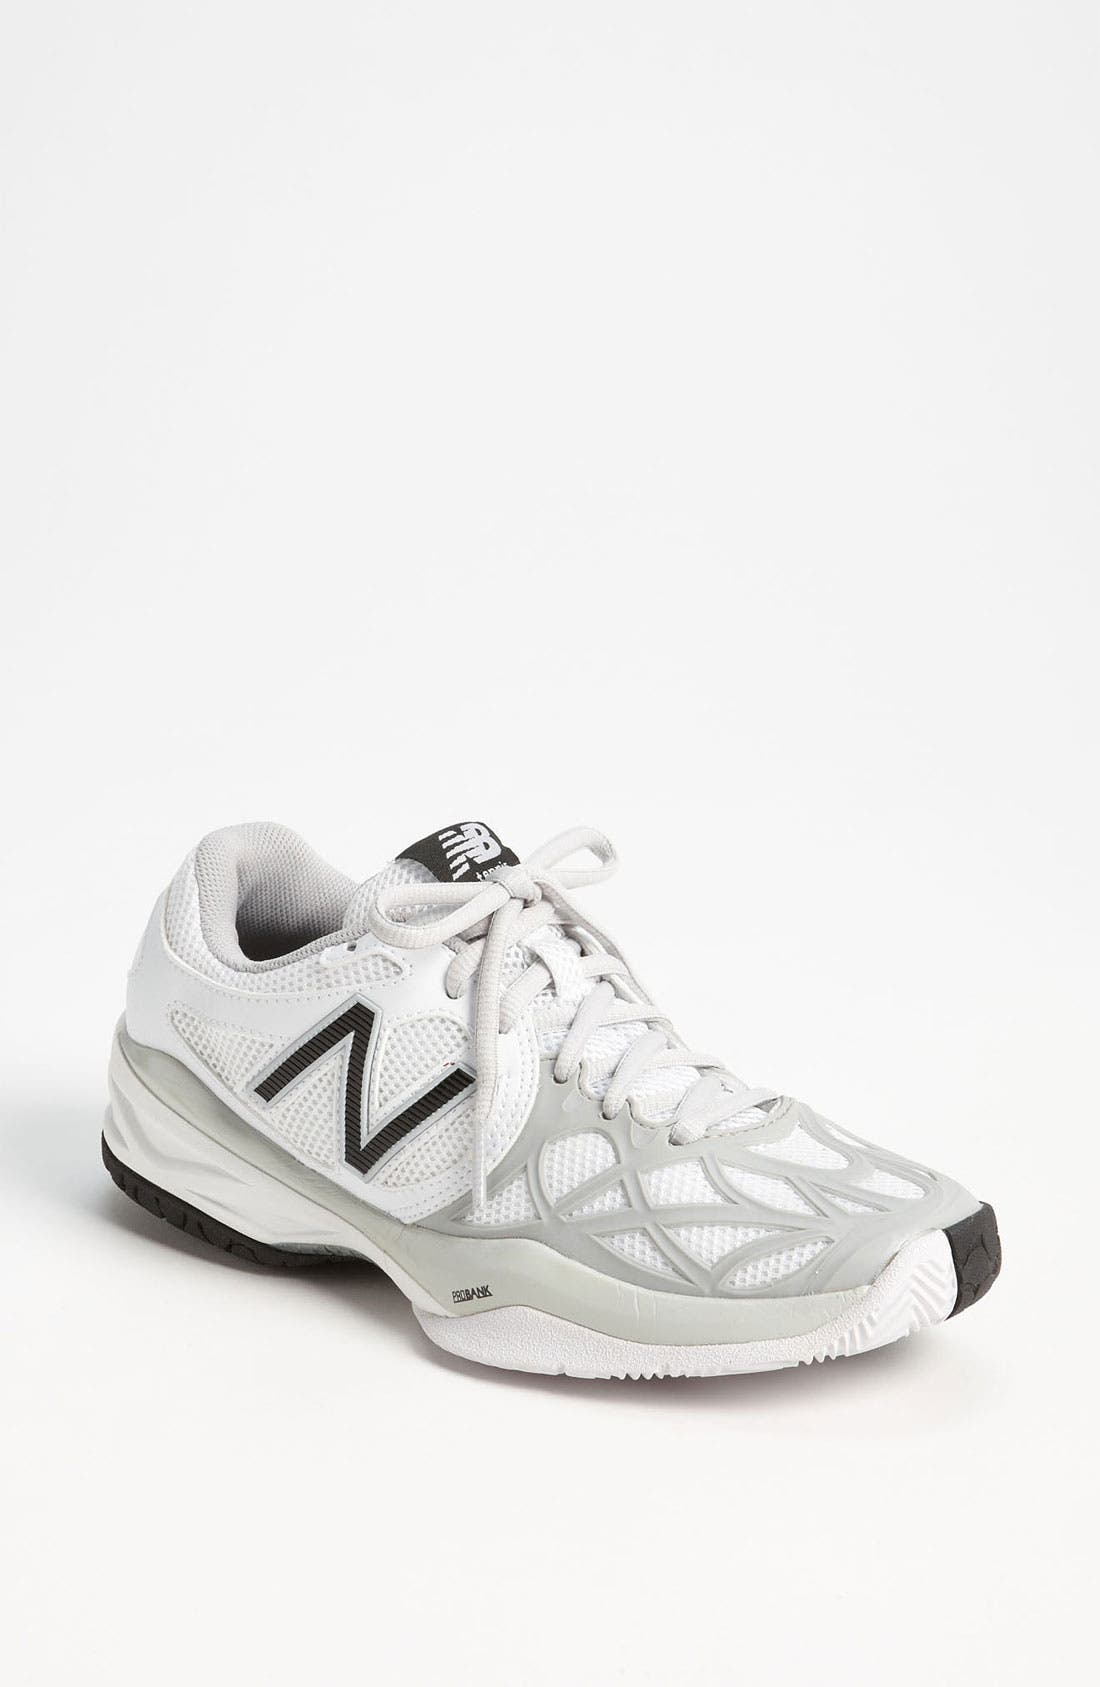 Main Image - New Balance '996' Tennis Shoe (Women)